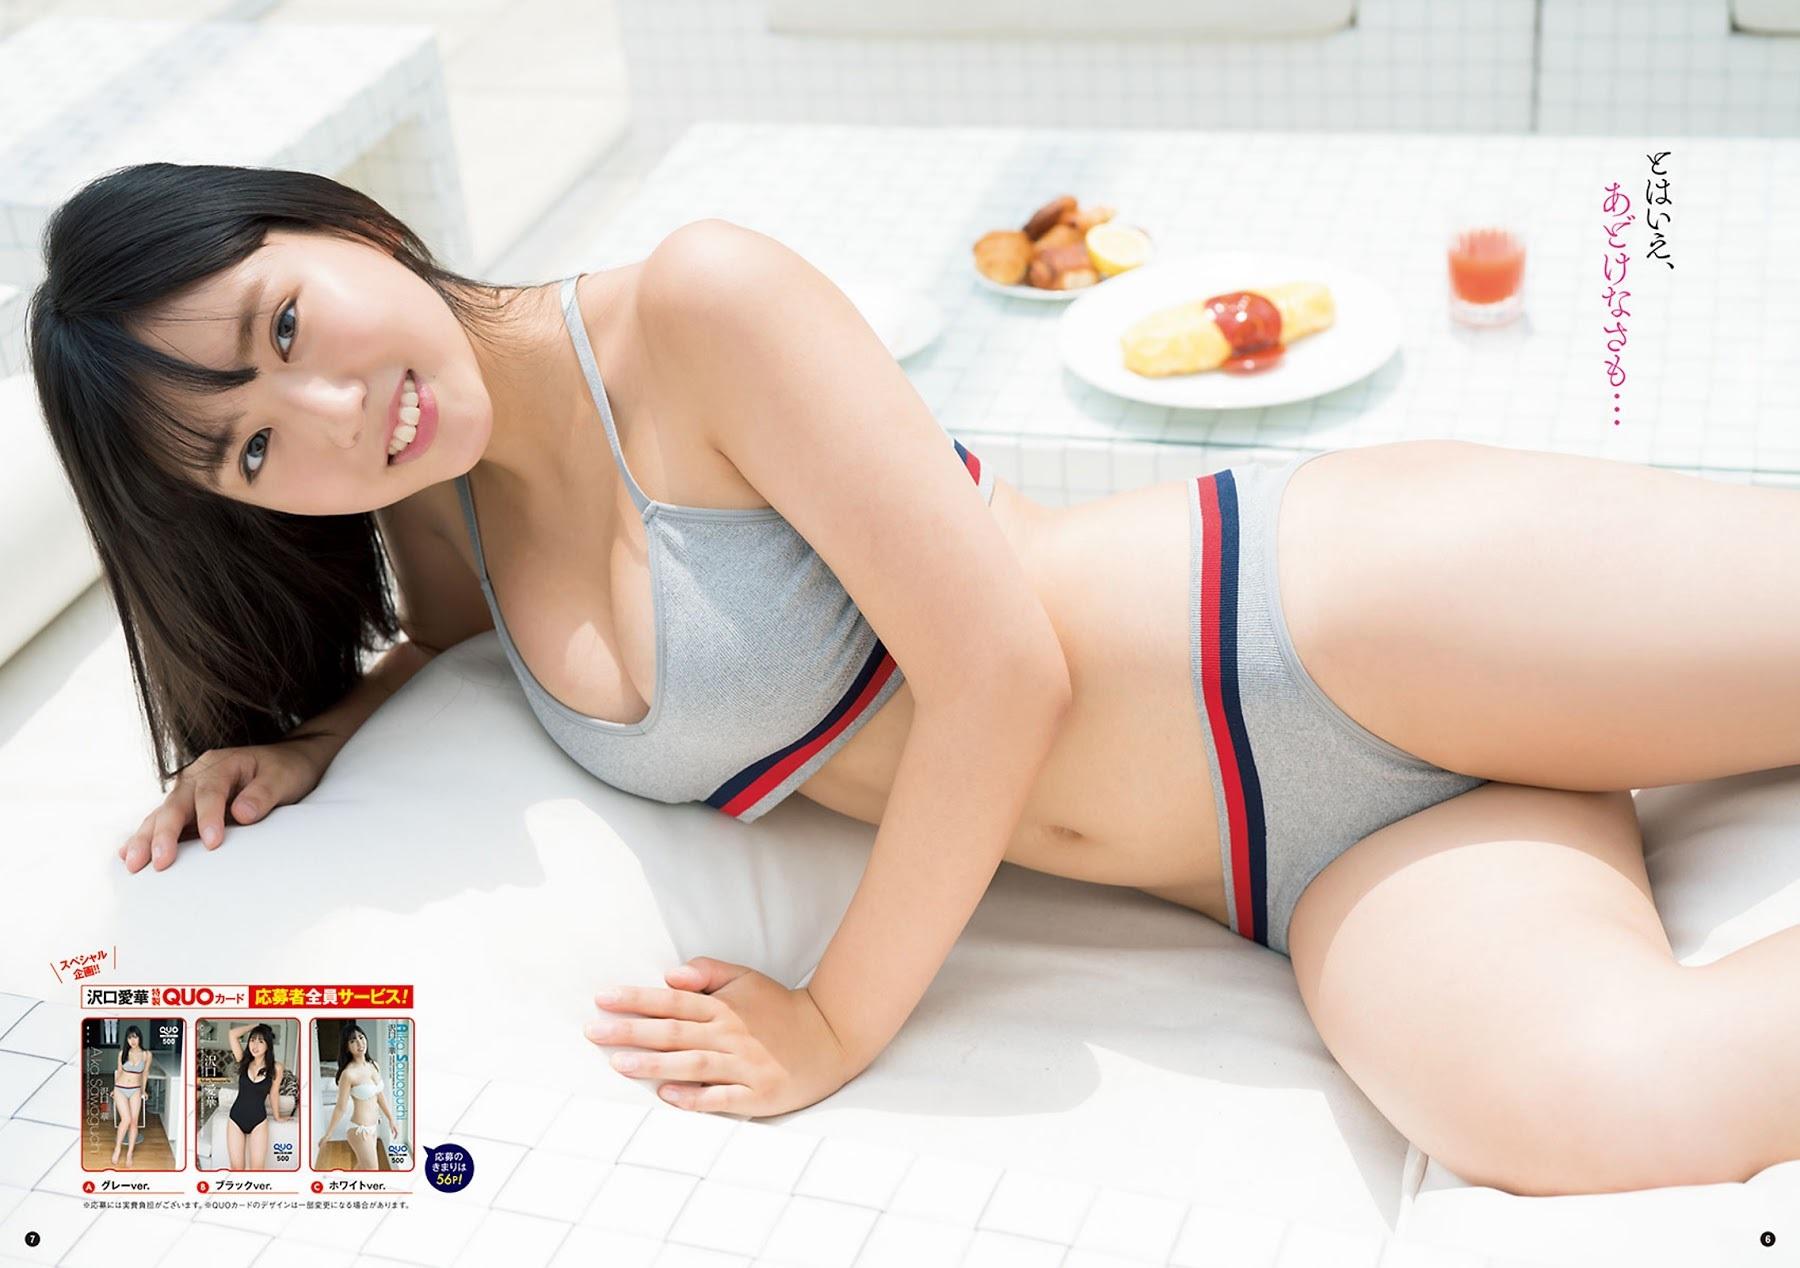 The miracle of popping JK body 17yearold Aika Sawaguchi Swimsuit Gravure 2020004